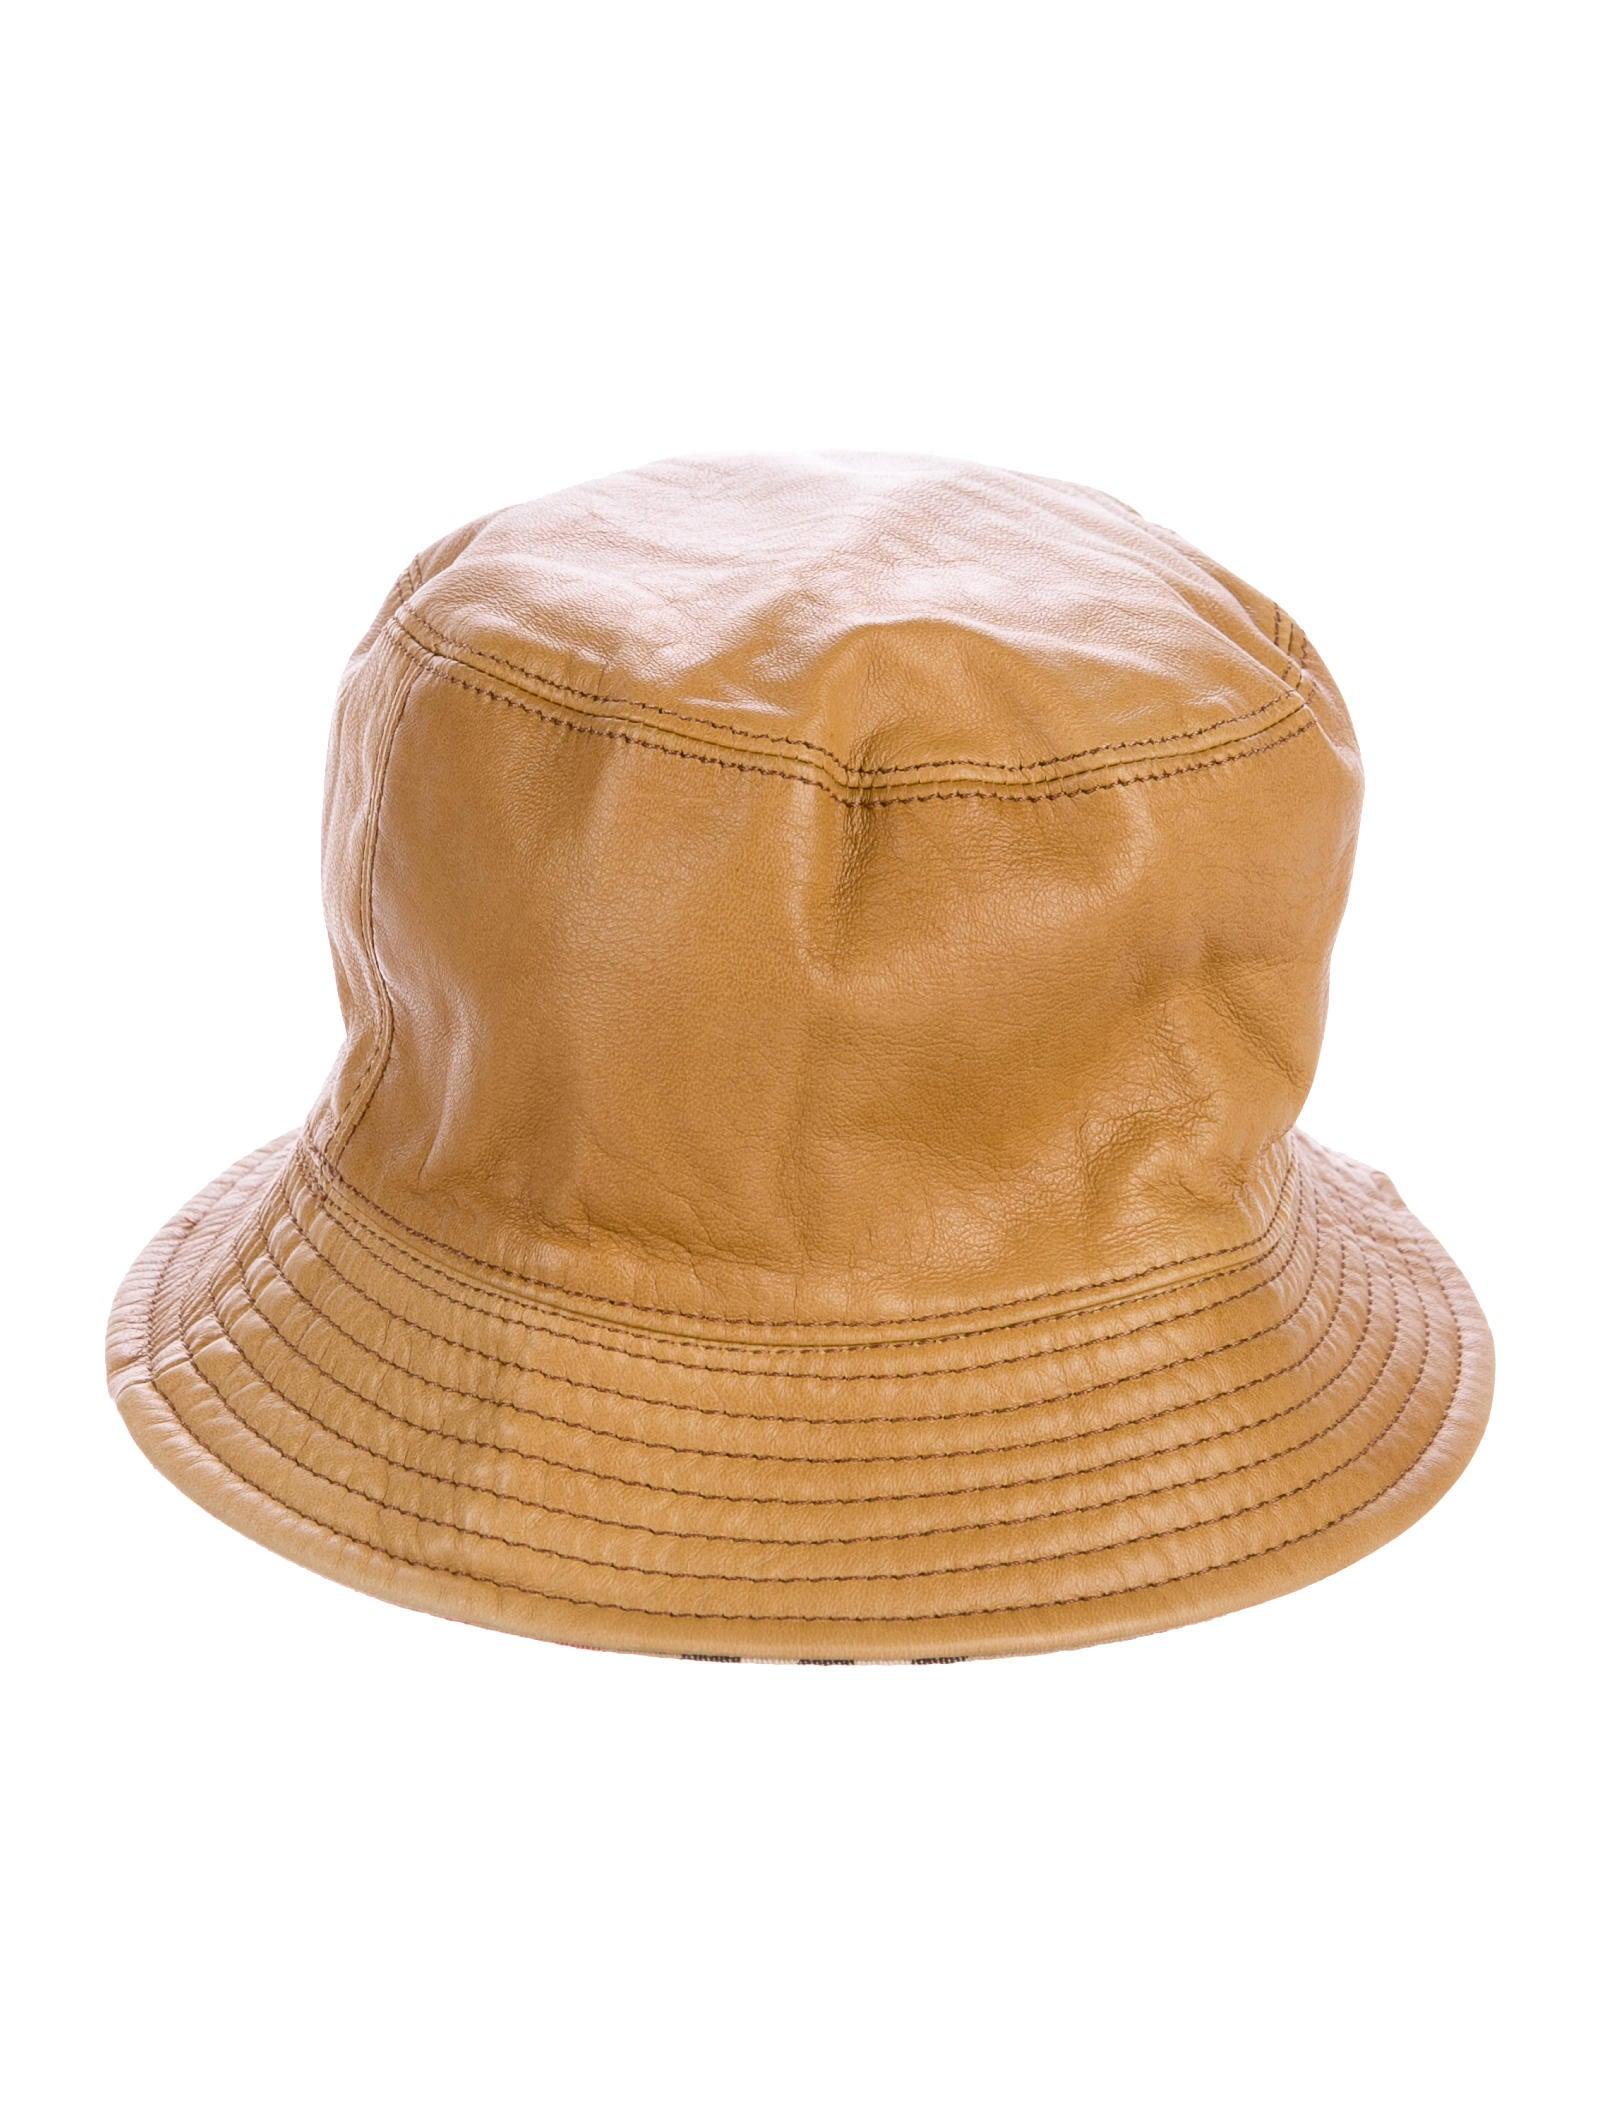 168dc5c1bfc9a Burberry Leather Reversible Bucket Hat - Accessories - BUR77367